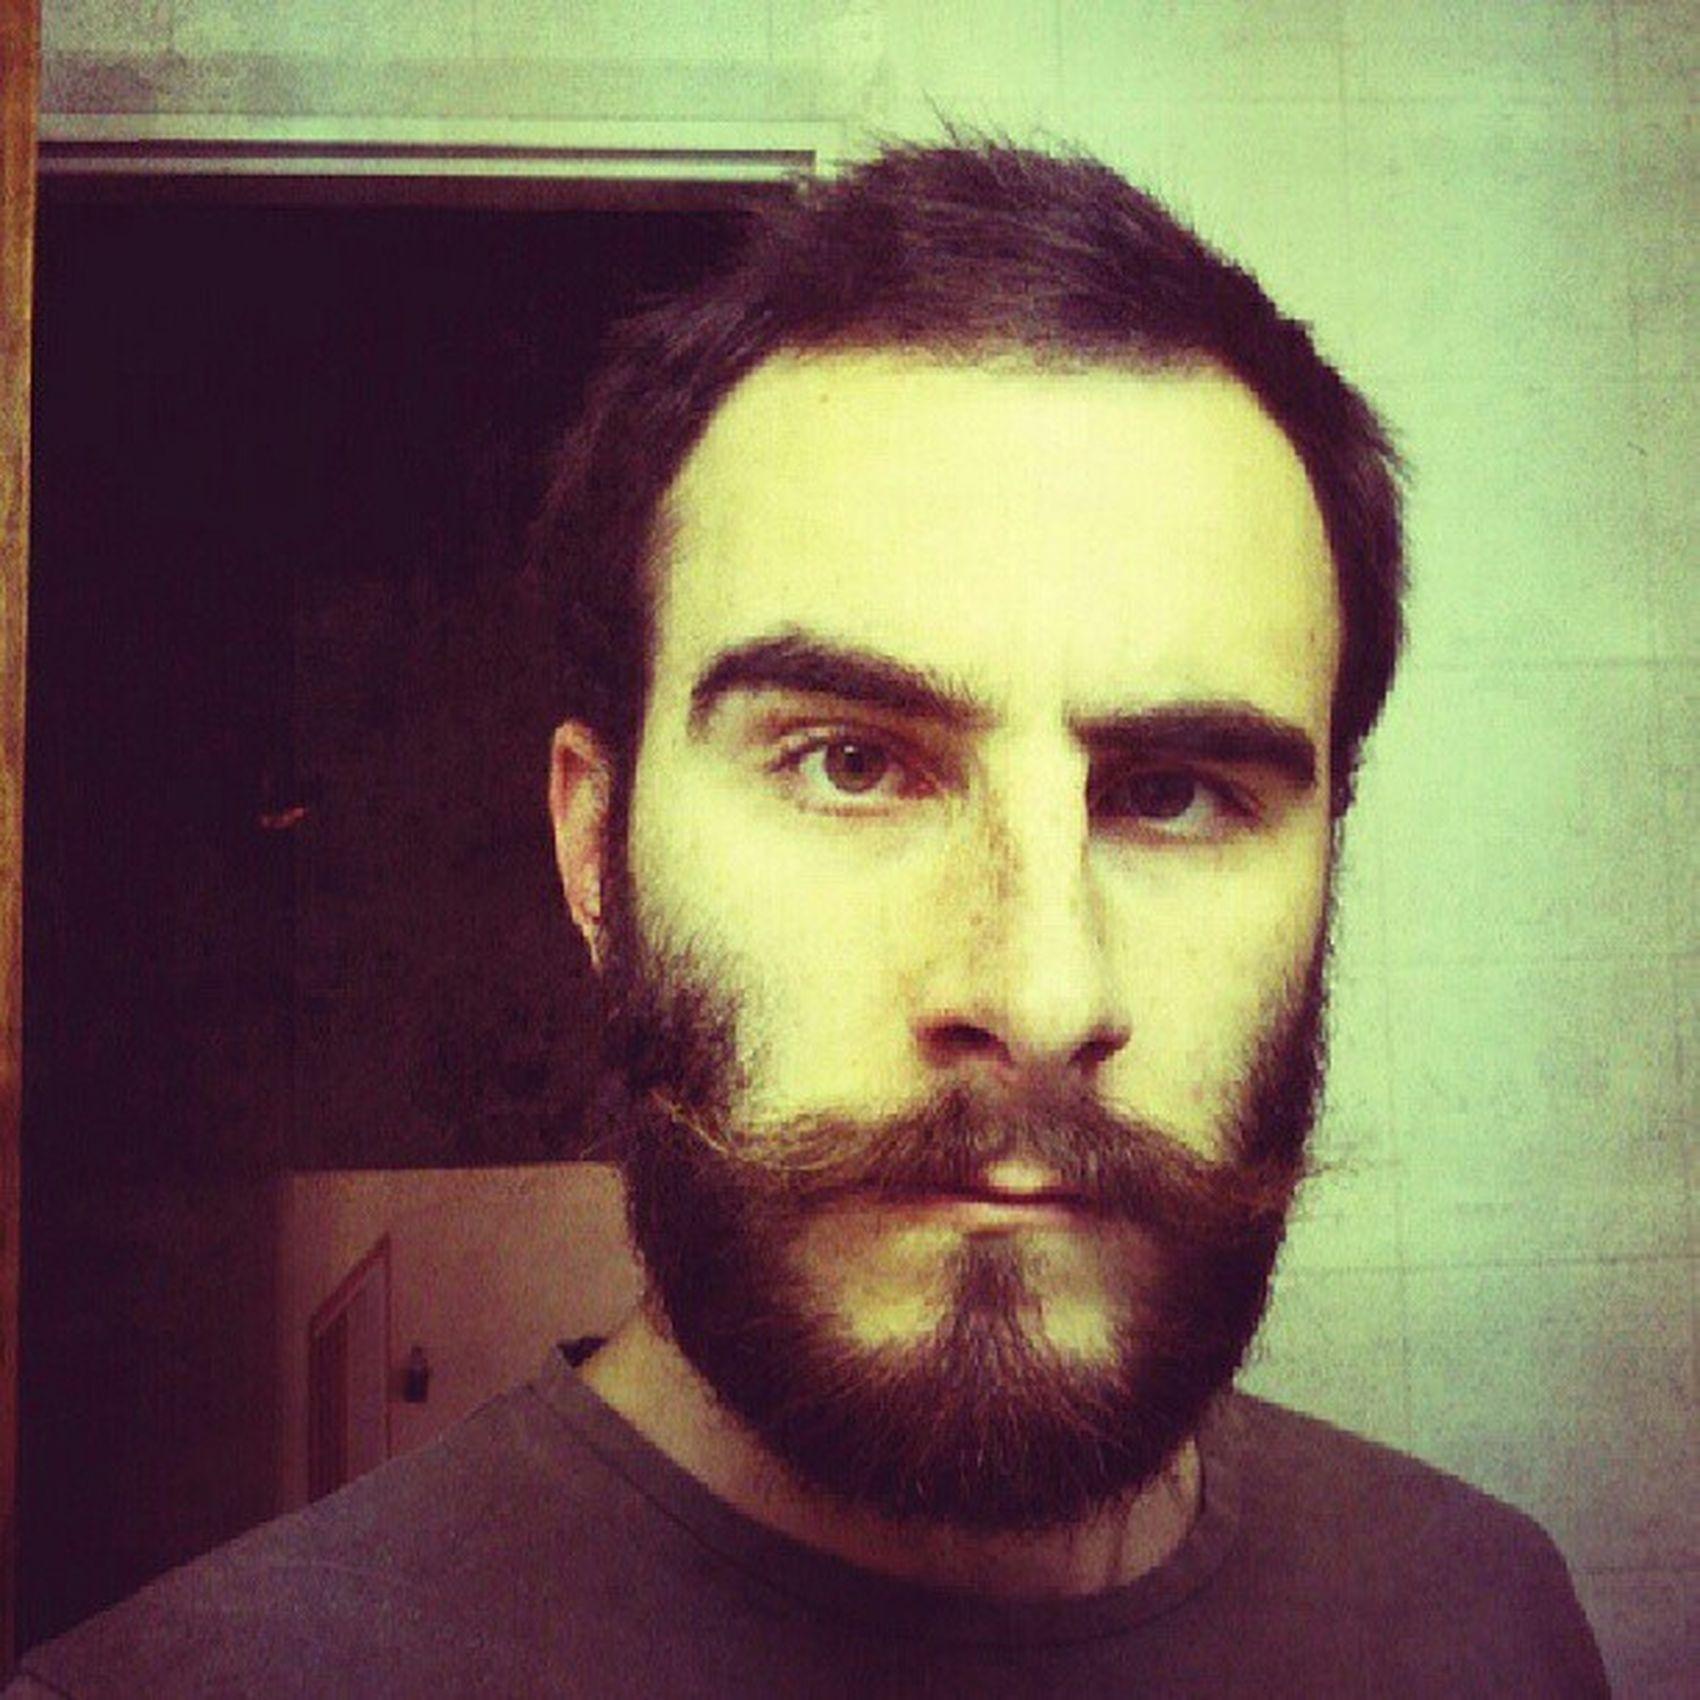 Me Moustache Beard Getreadypeople gnarleybeard gnarleystache myface myself selfie self stayclassy ego yo instalike igdaily portrait face classy crazy